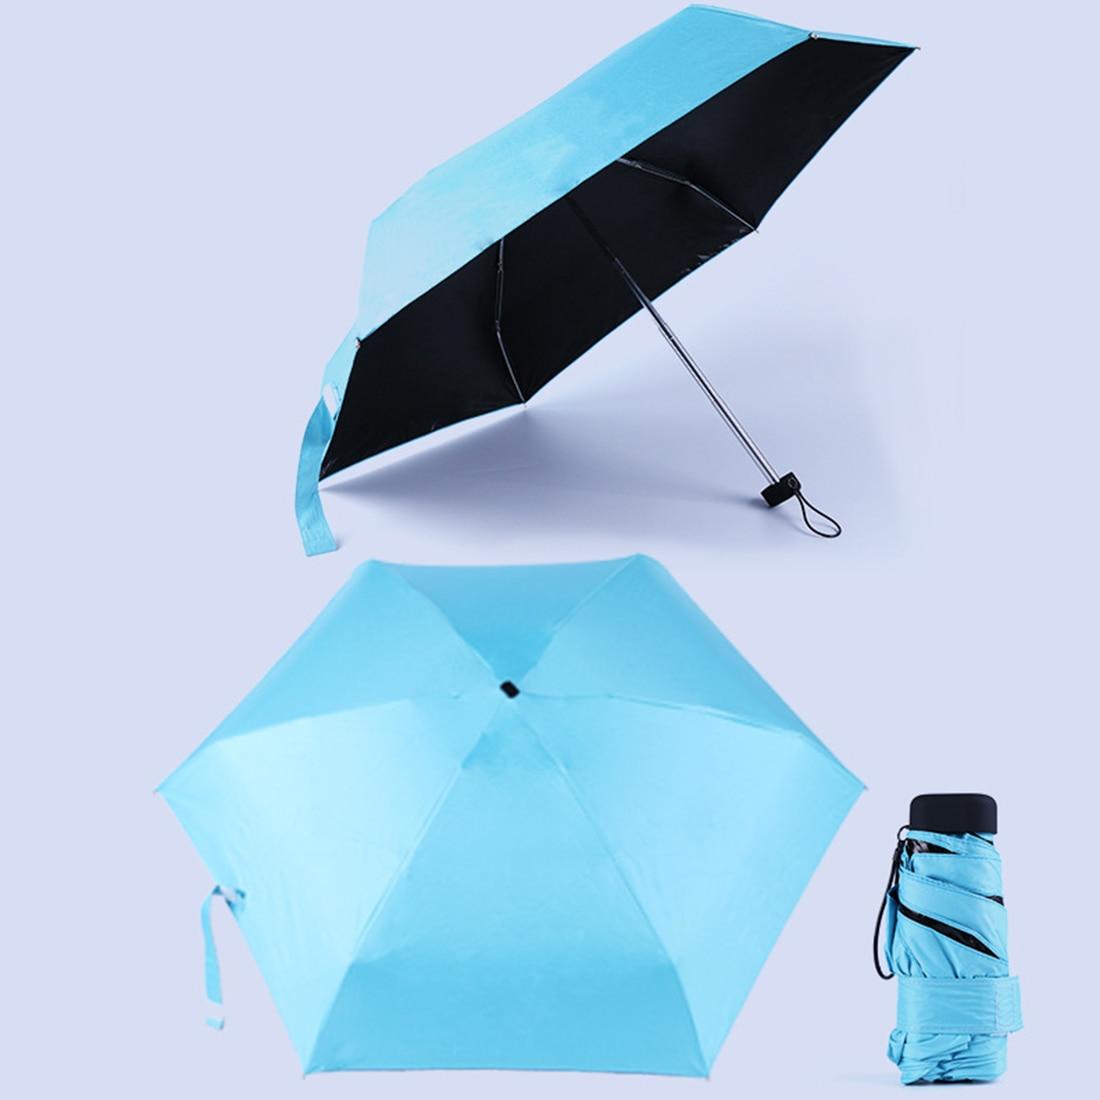 d8a2d87f785e US $7.4 16% OFF|Mini Pocket Umbrella Women Sunny and Rainy Mini Folding  Umbrellas 200g Small Sun Parasol Umbrella-in Umbrellas from Home & Garden  on ...